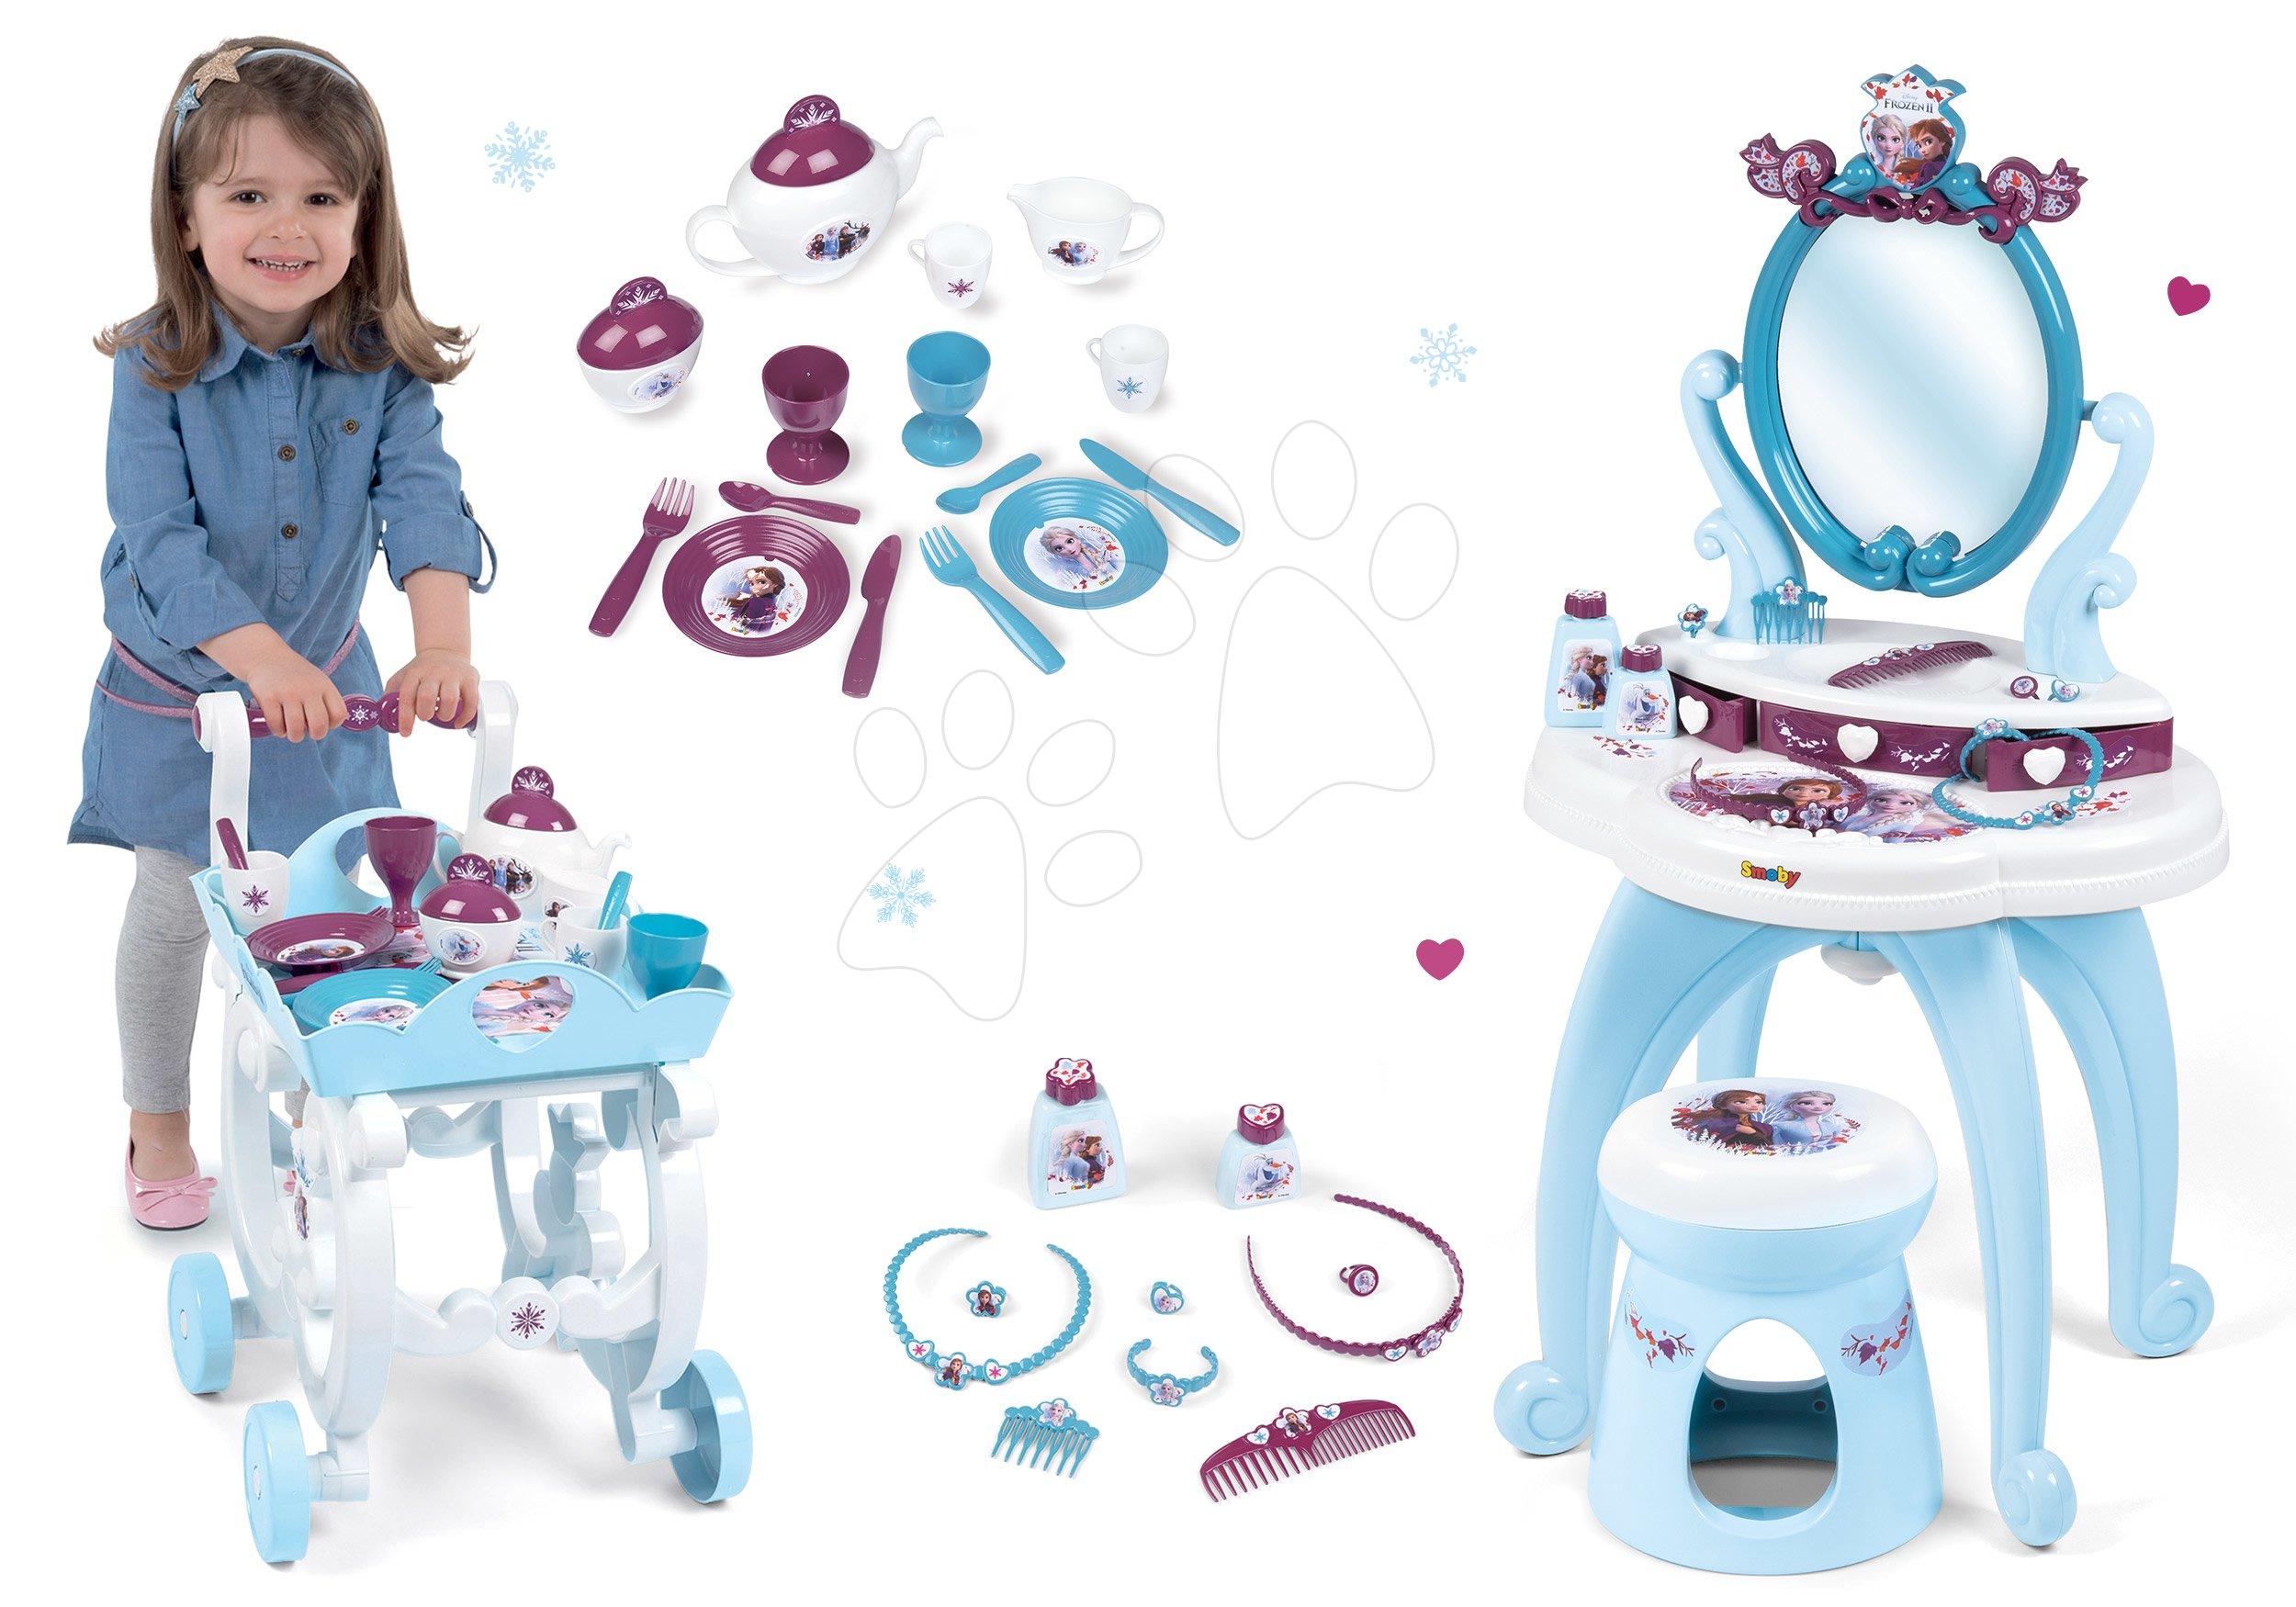 Smoby kozmetický stolík a čajová súprava na vozíku Frozen 320214-1